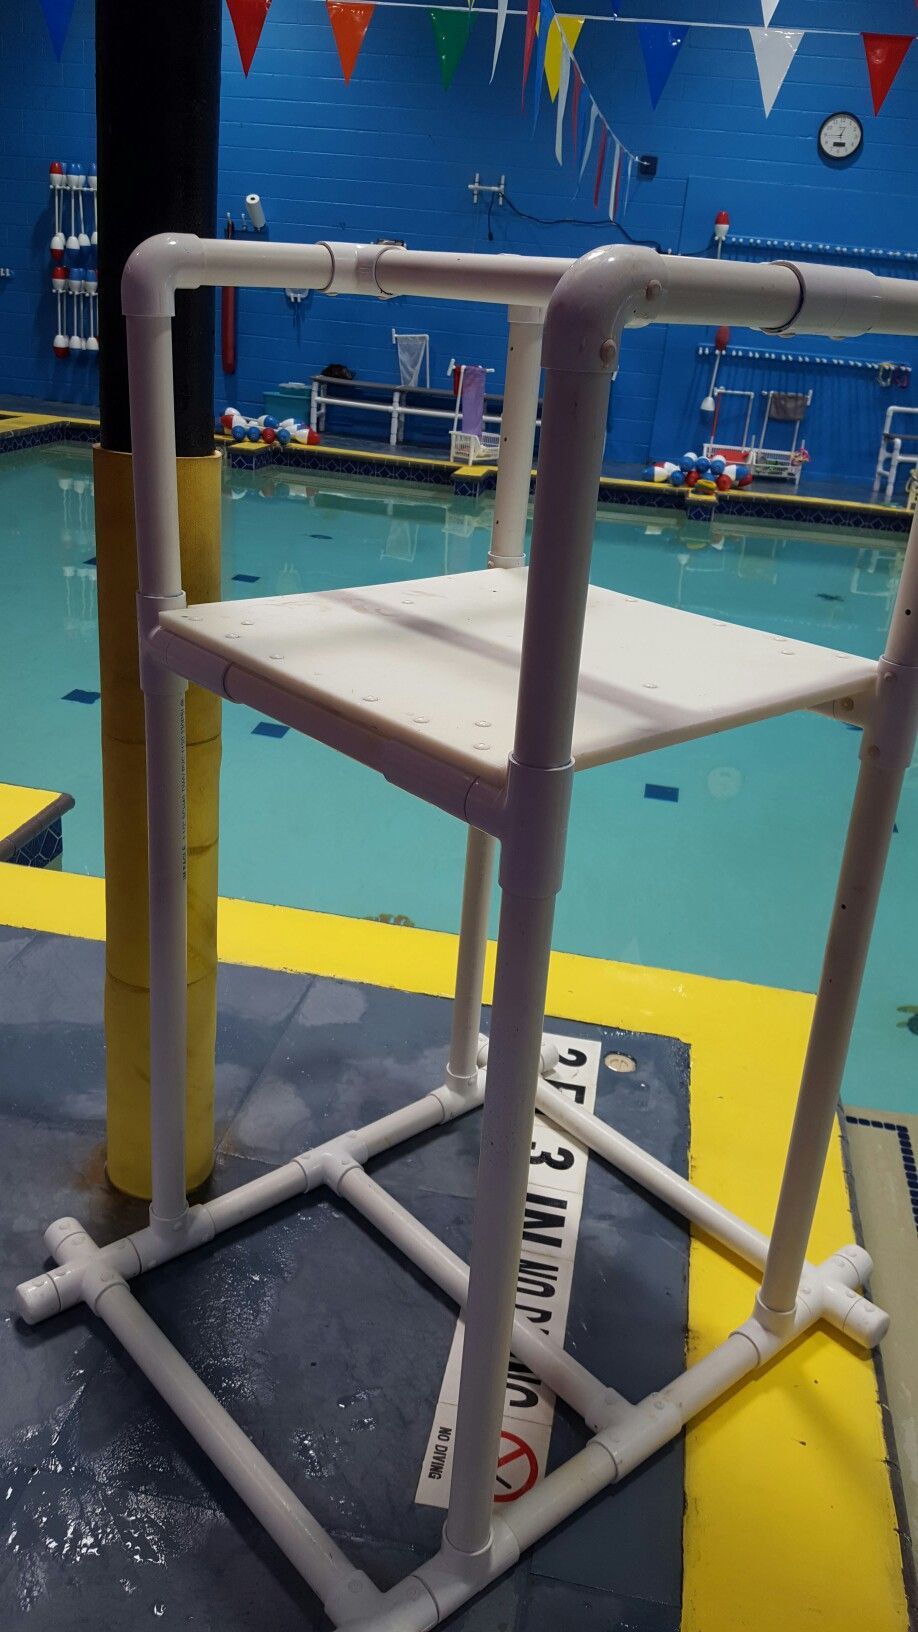 Pvc custom pool platform for swim lessons fun projects - Above ground pool platform ...